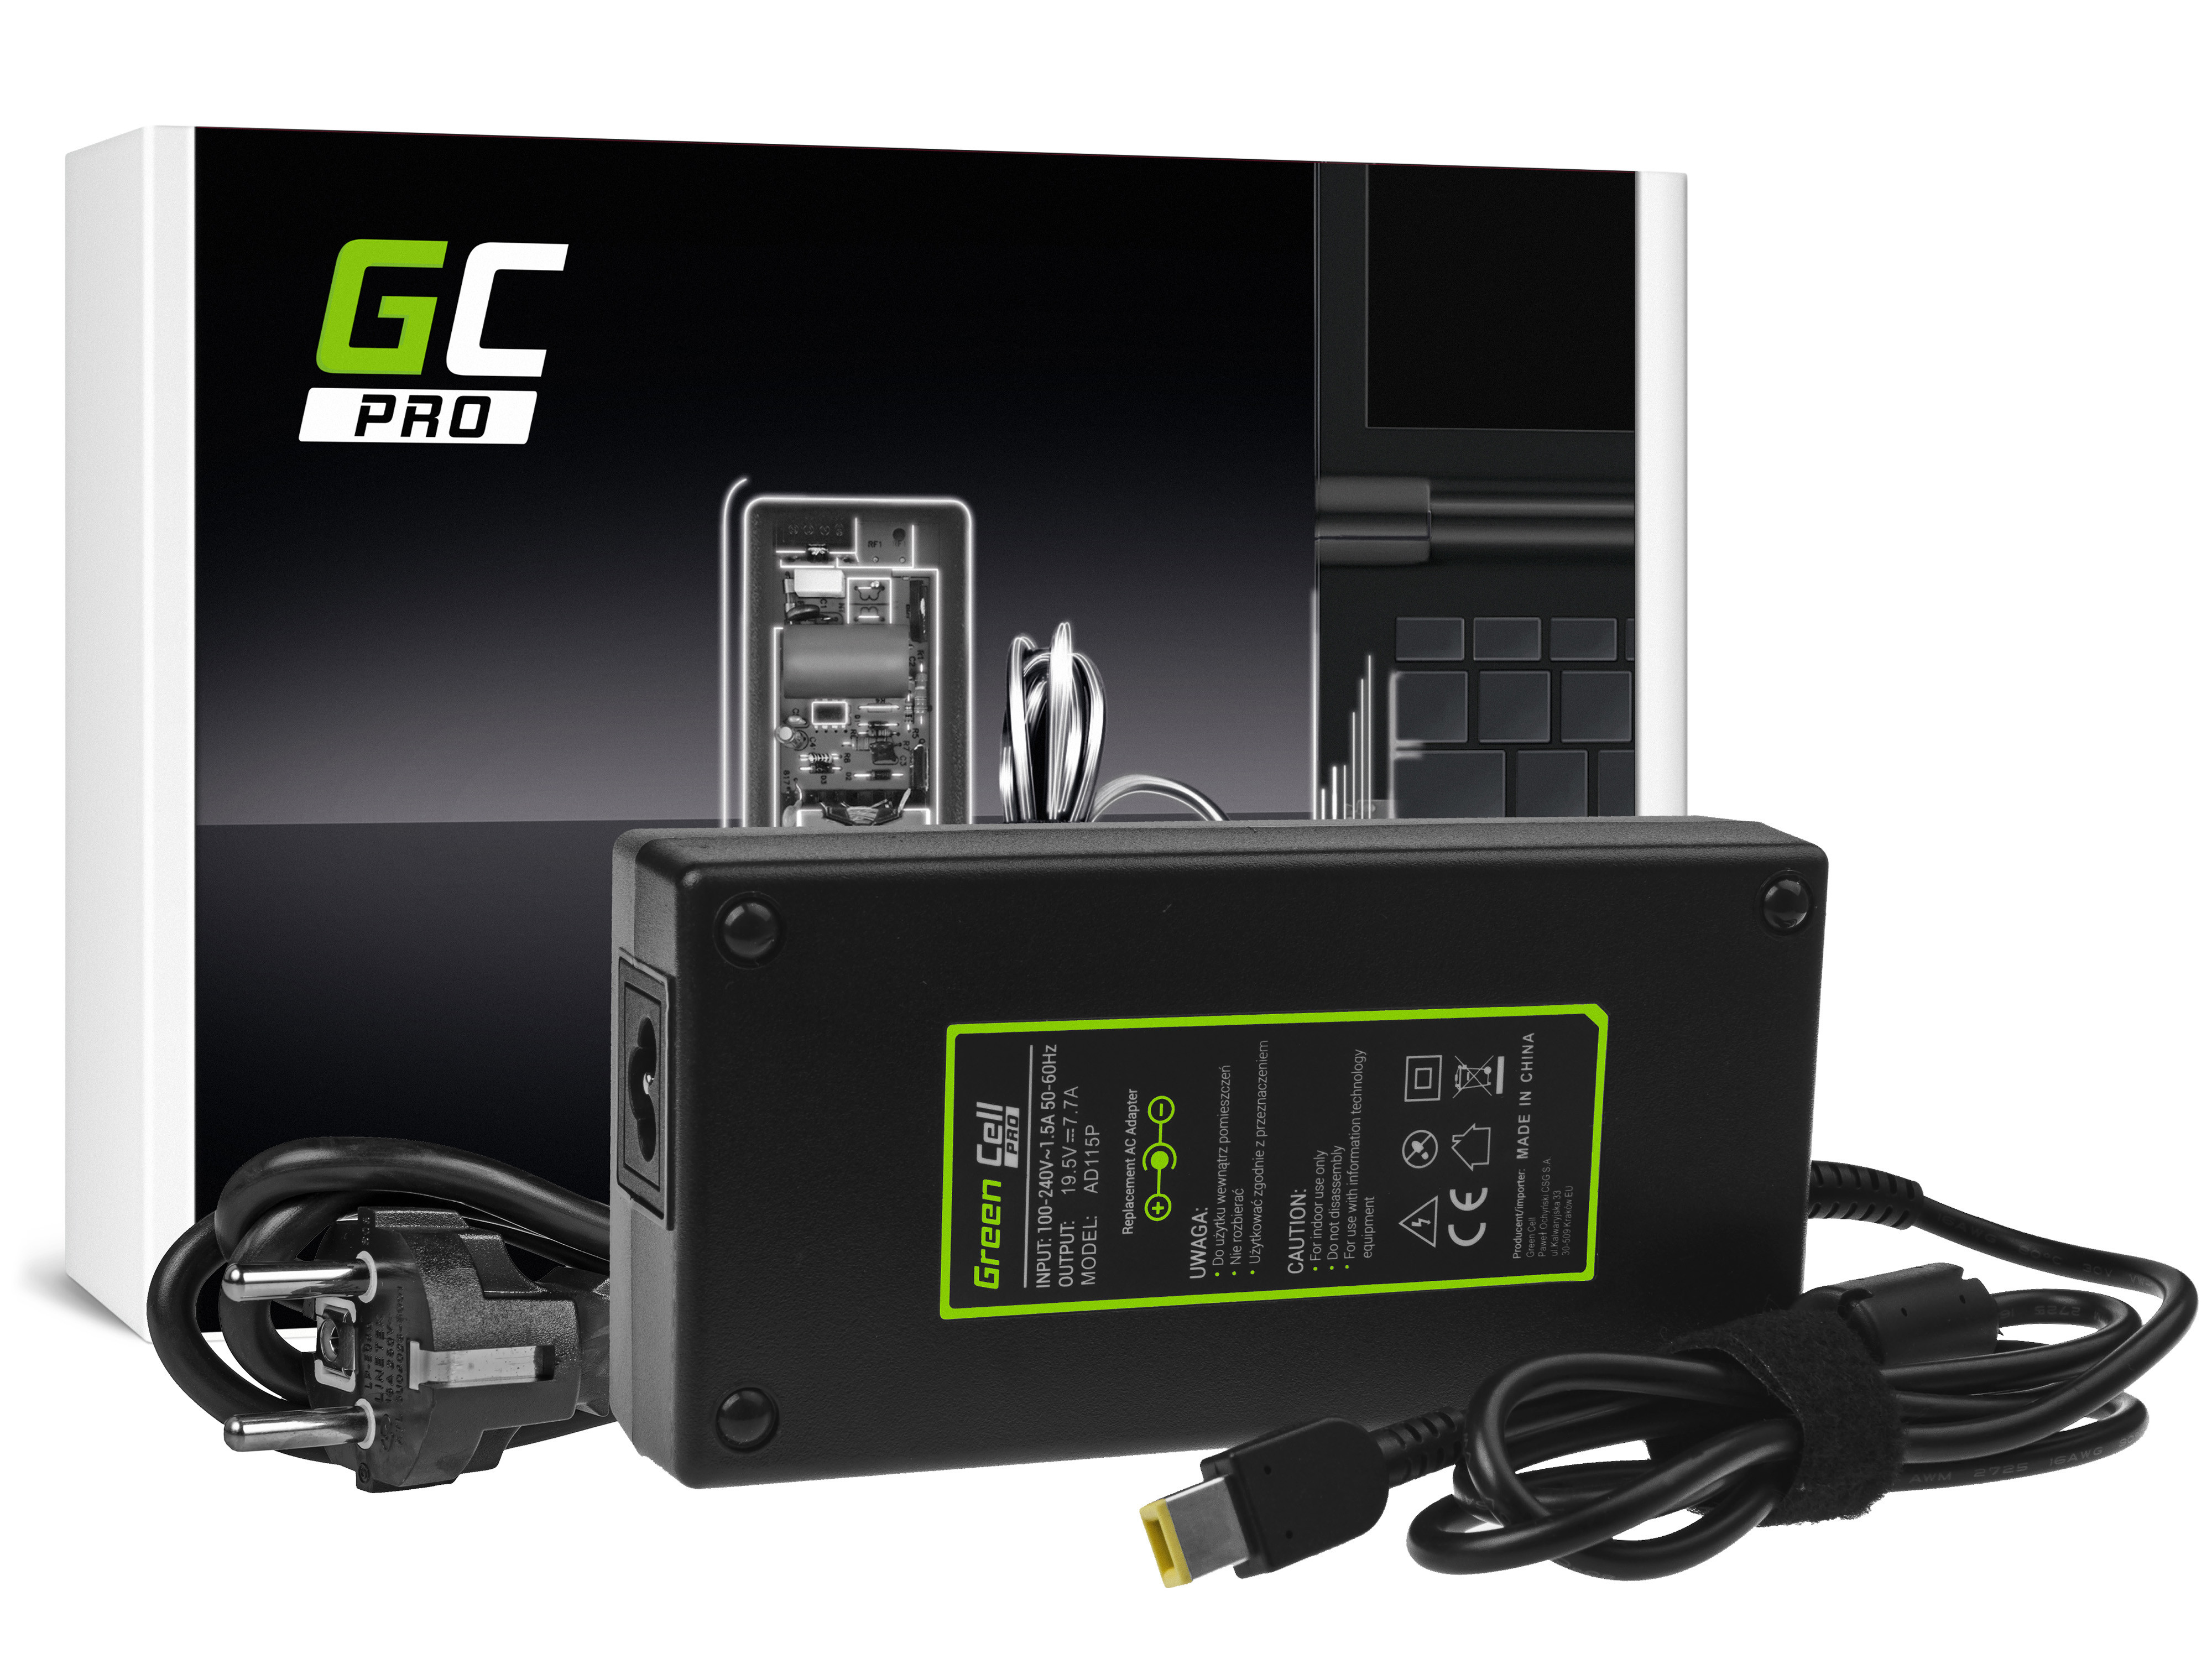 Green Cell AD115P Adaptér Nabíječka Lenovo Ideacentre 310-15ASR 310S-08ASR 520-27IKL 910-27ISH A540 A740 S40-40 19.5V 7.7A 150W